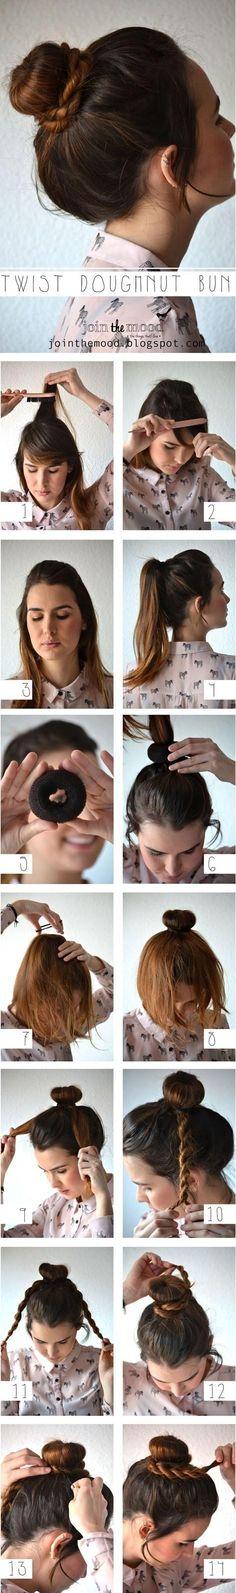 twist doughnut bun.